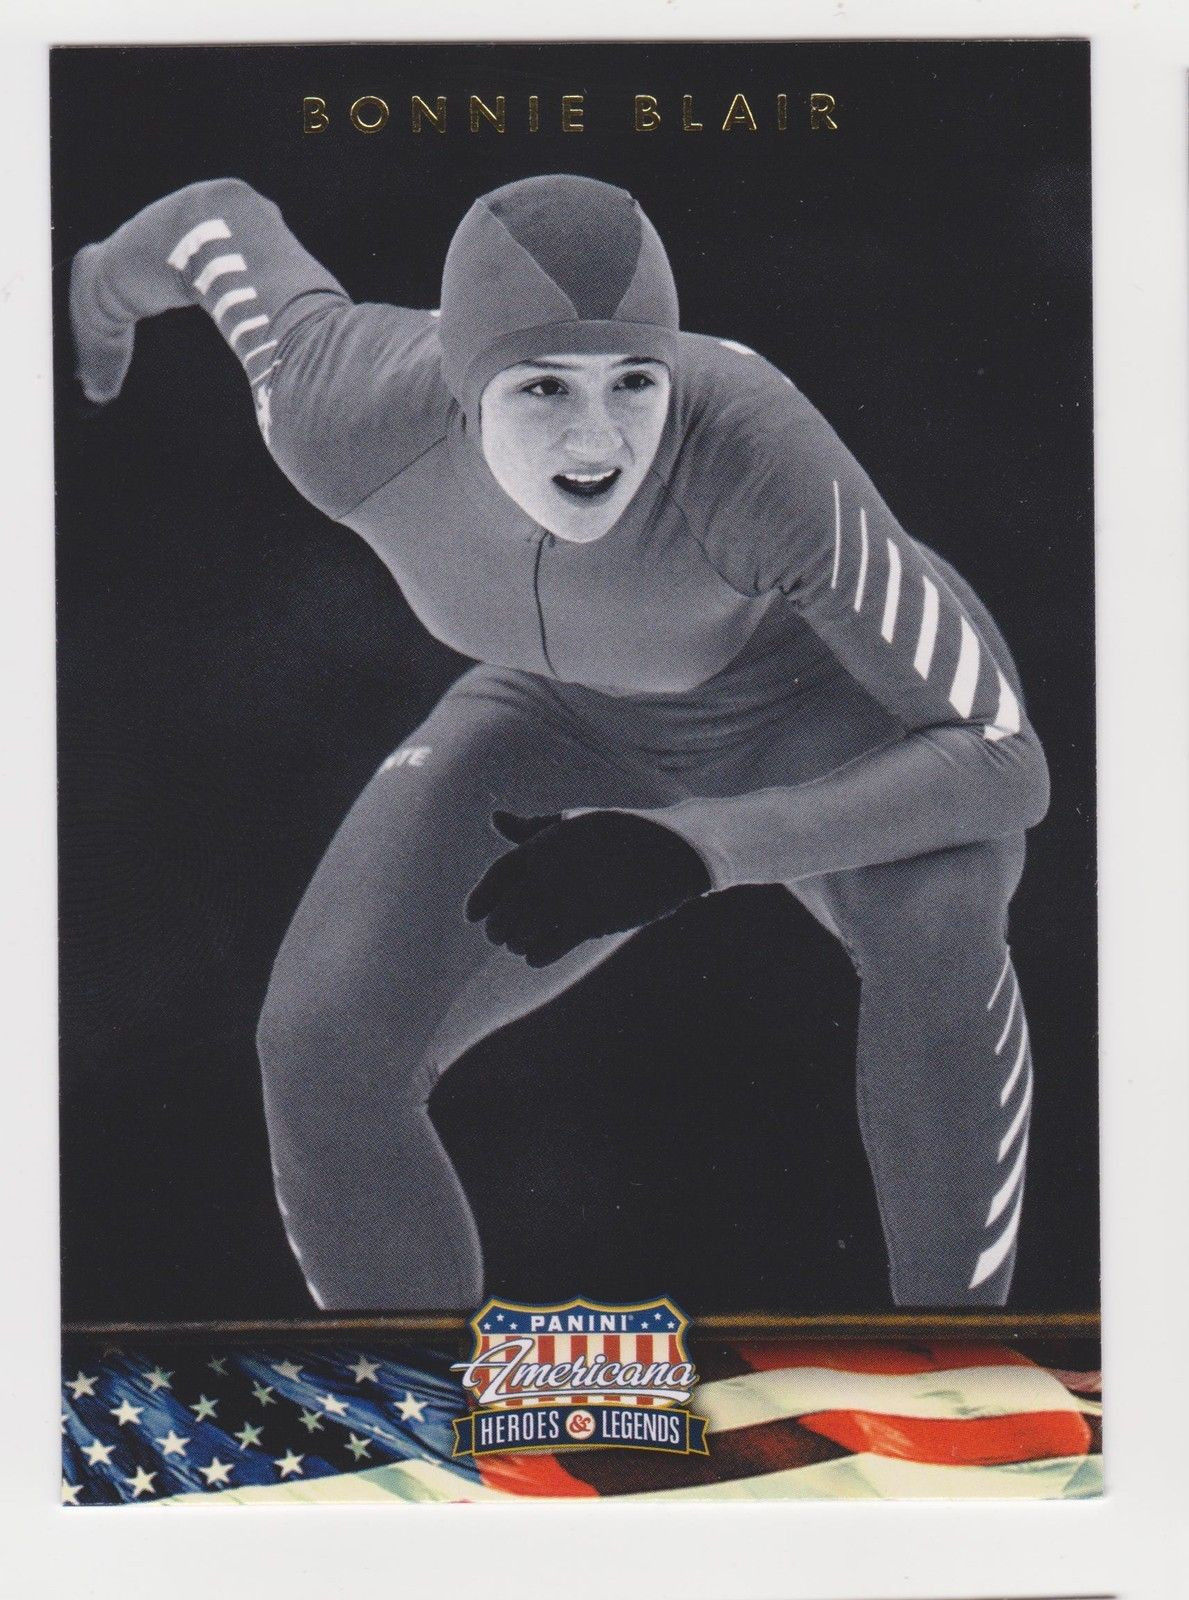 2012 Panini Americana Heroes & Legends BONNIE BLAIR #64 Olympic Speed Skater